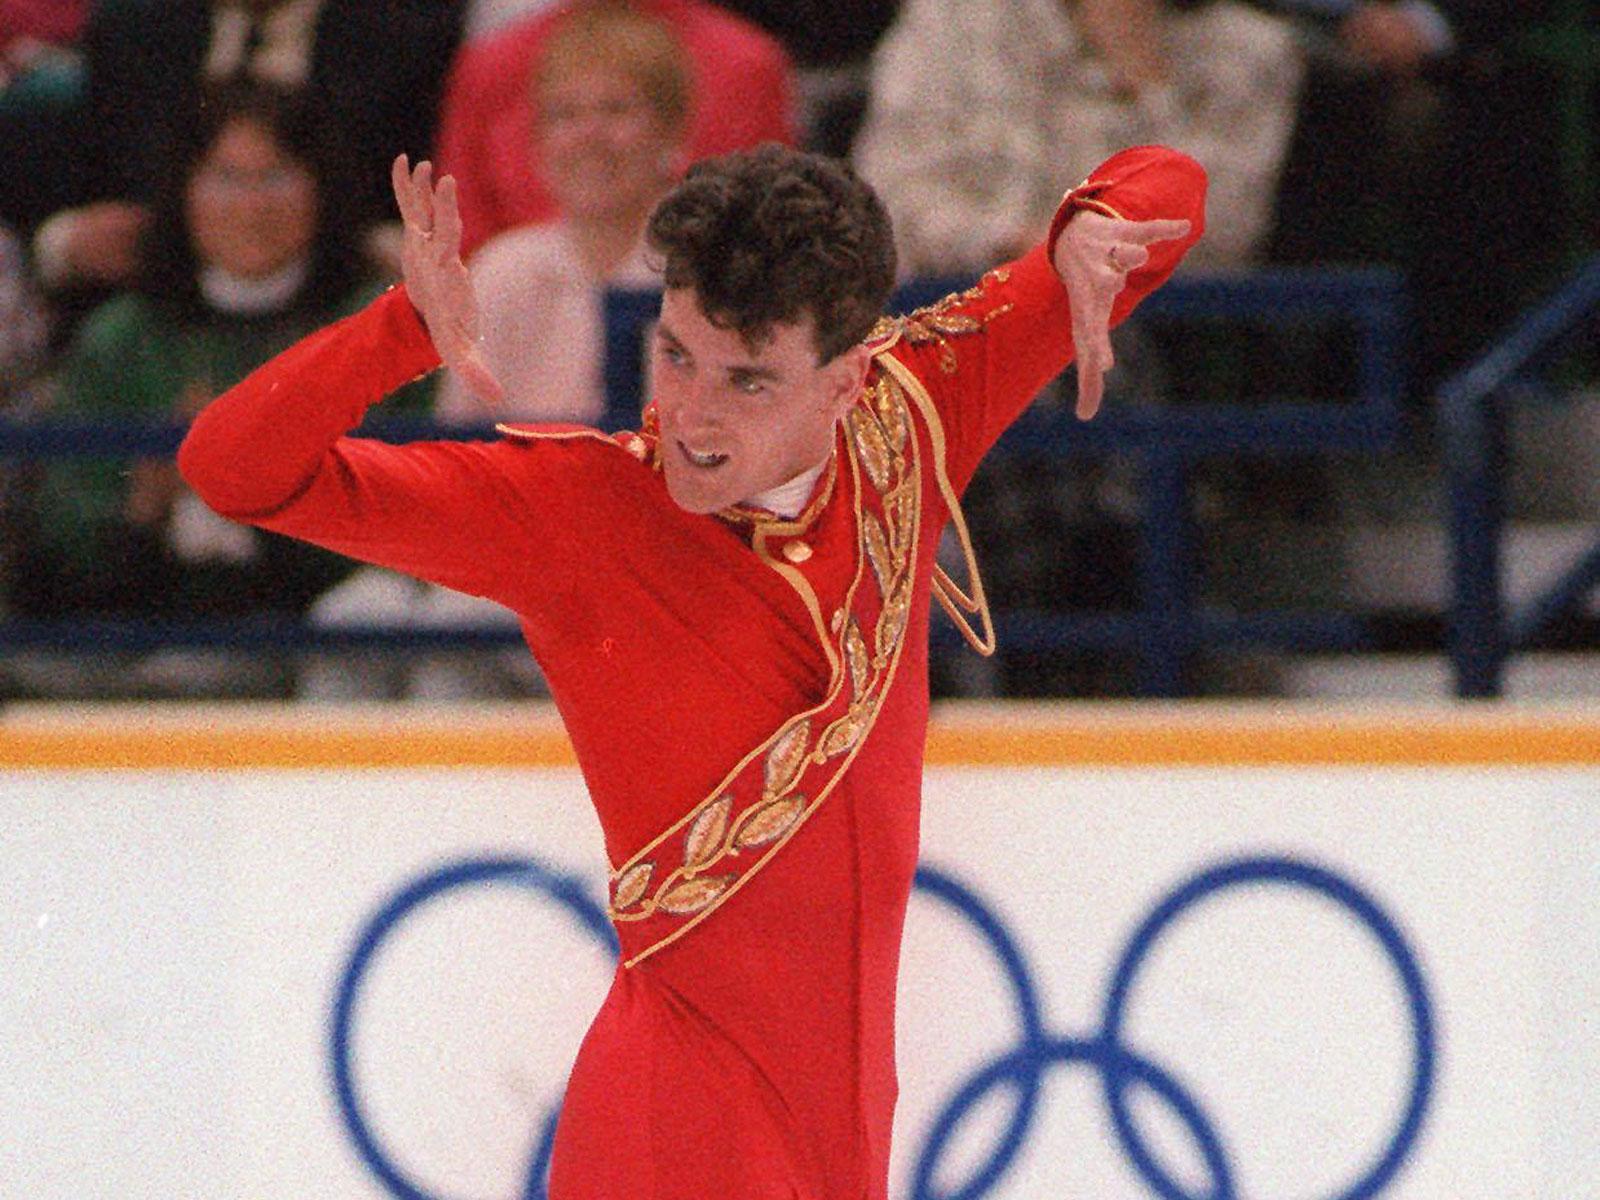 брайан орсер на олимпийских играх